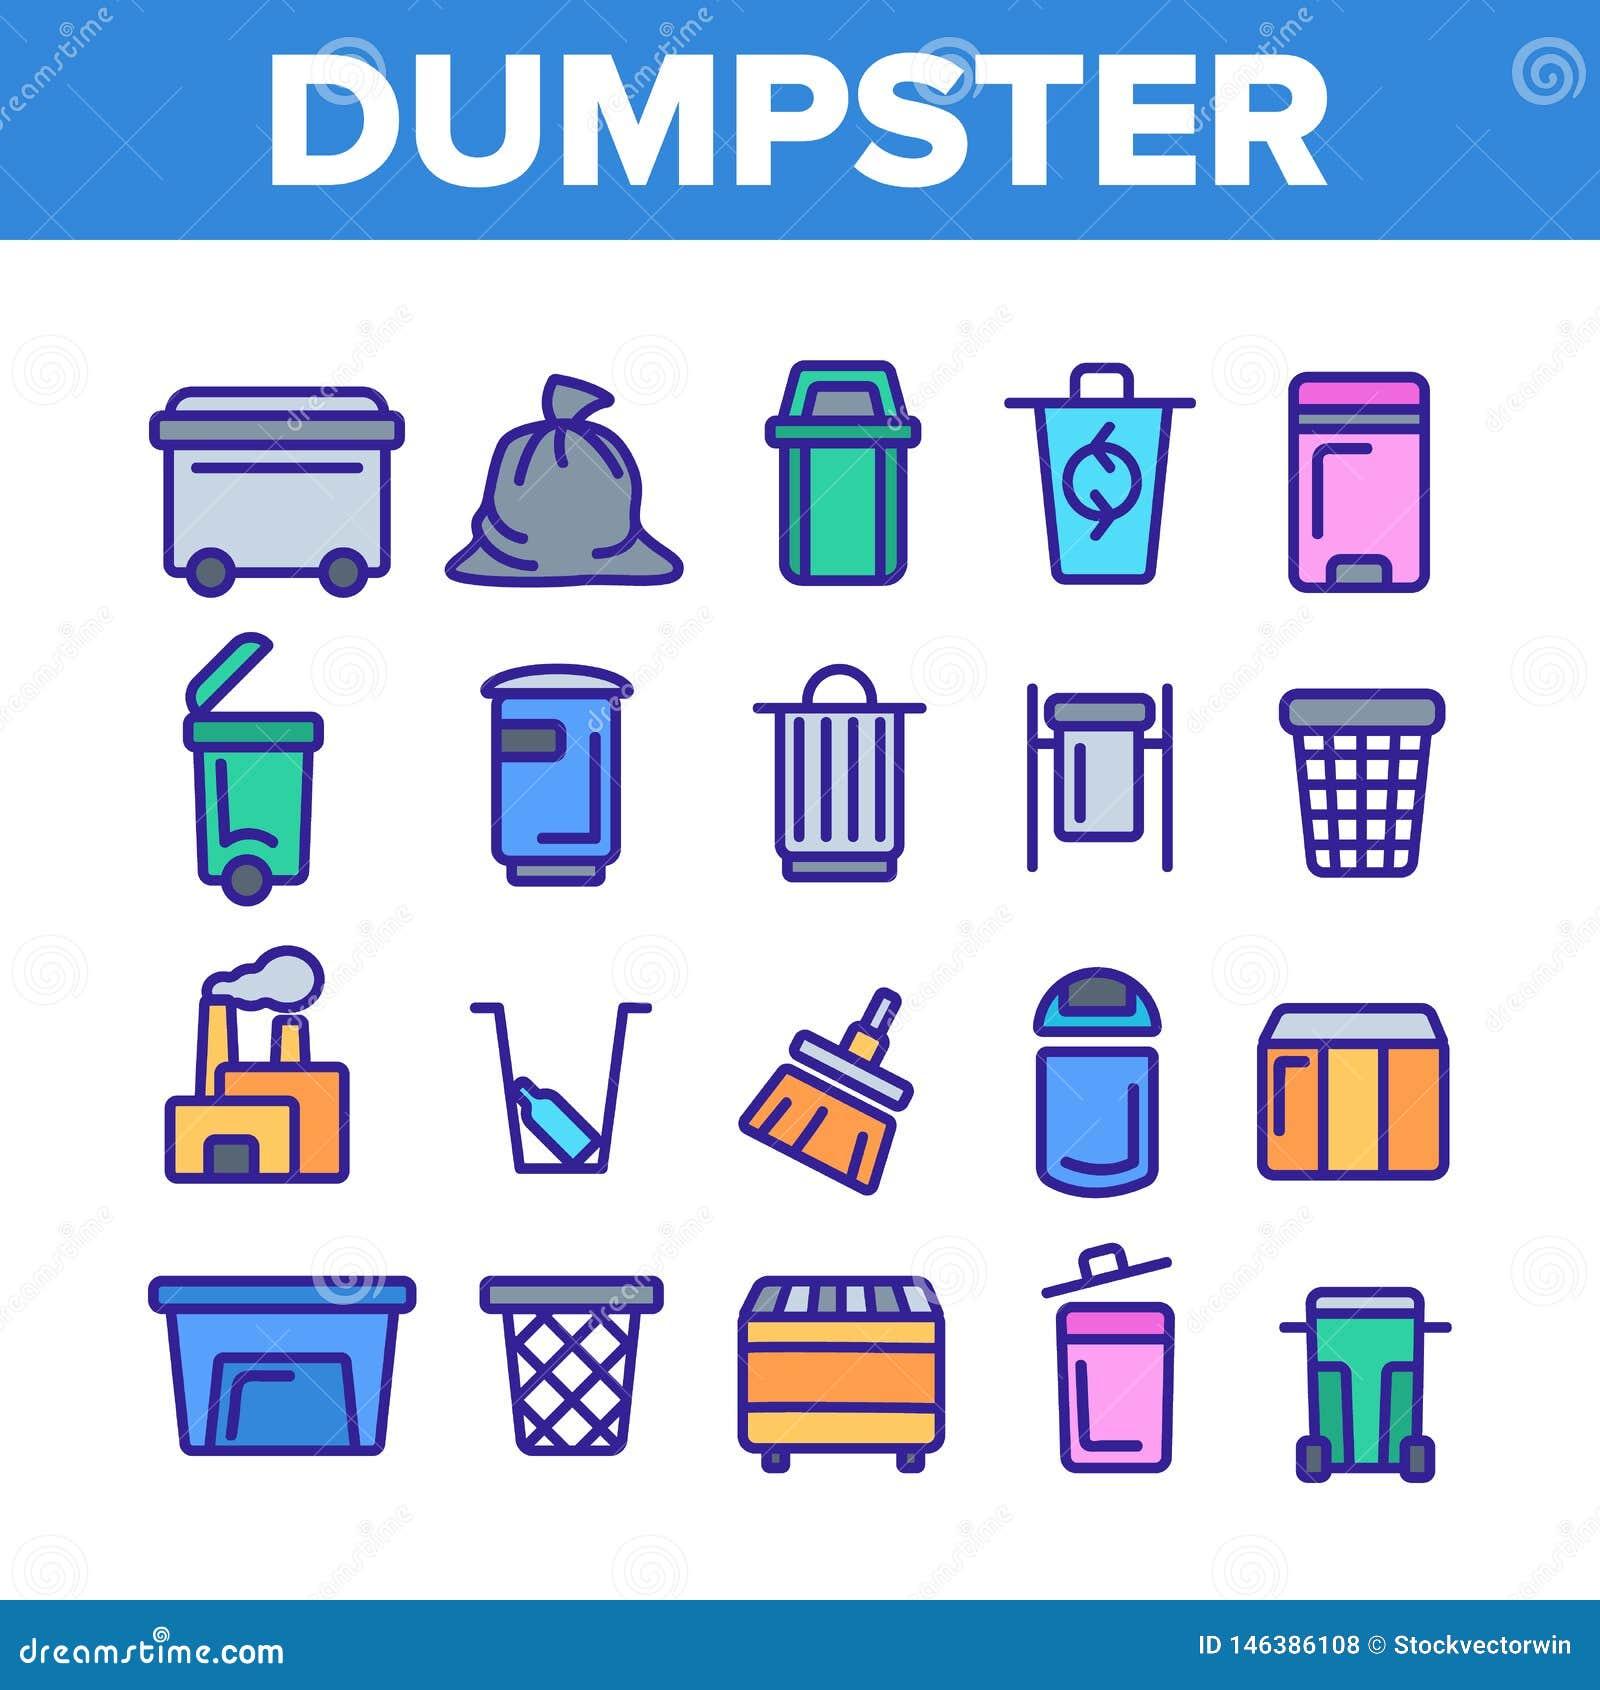 Dumpster, λεπτά εικονίδια γραμμών εμπορευματοκιβωτίων απορριμάτων καθορισμένα